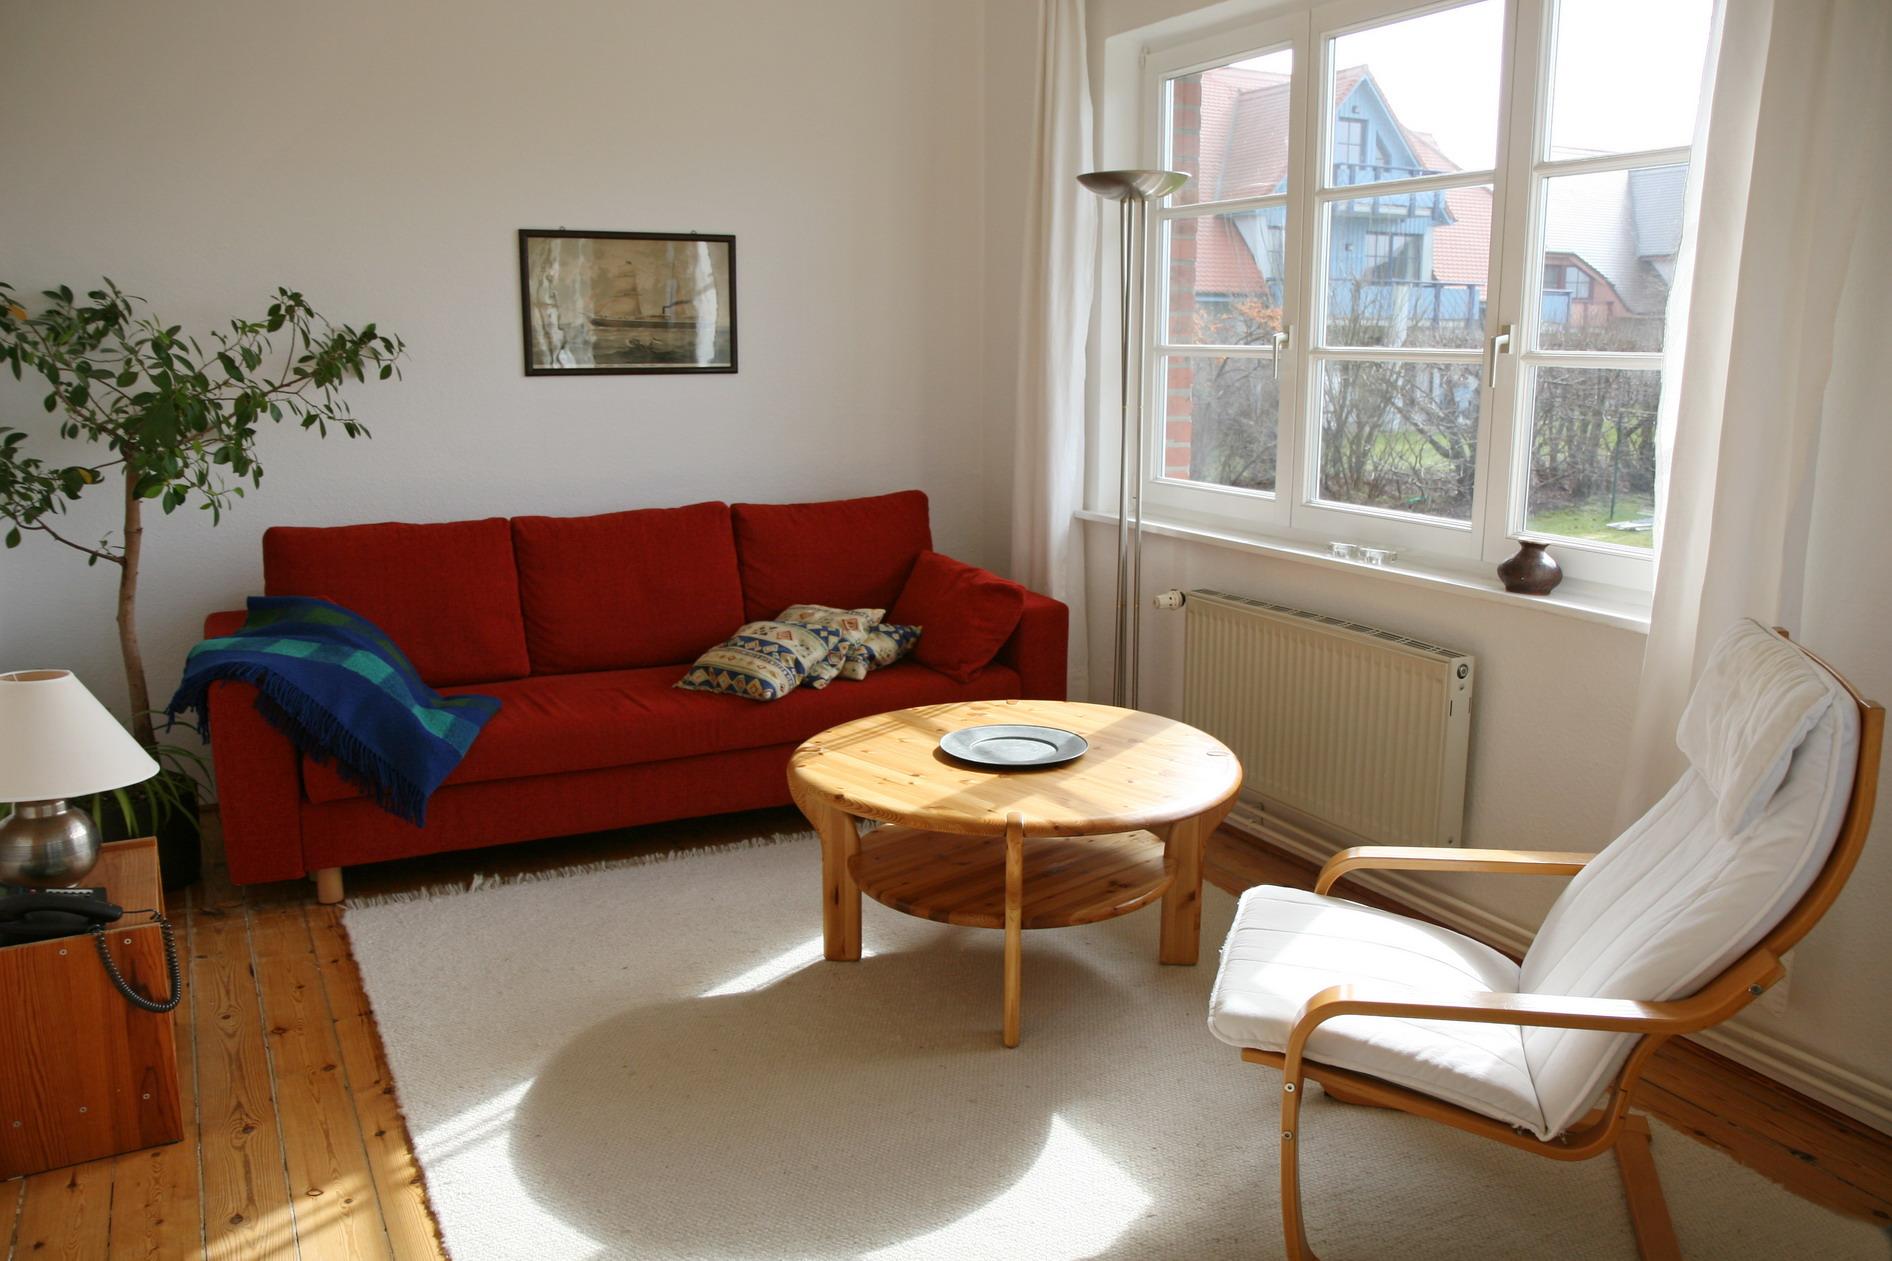 Wandgestaltung Wohnzimmer : Wandgestaltung Wohnzimmer